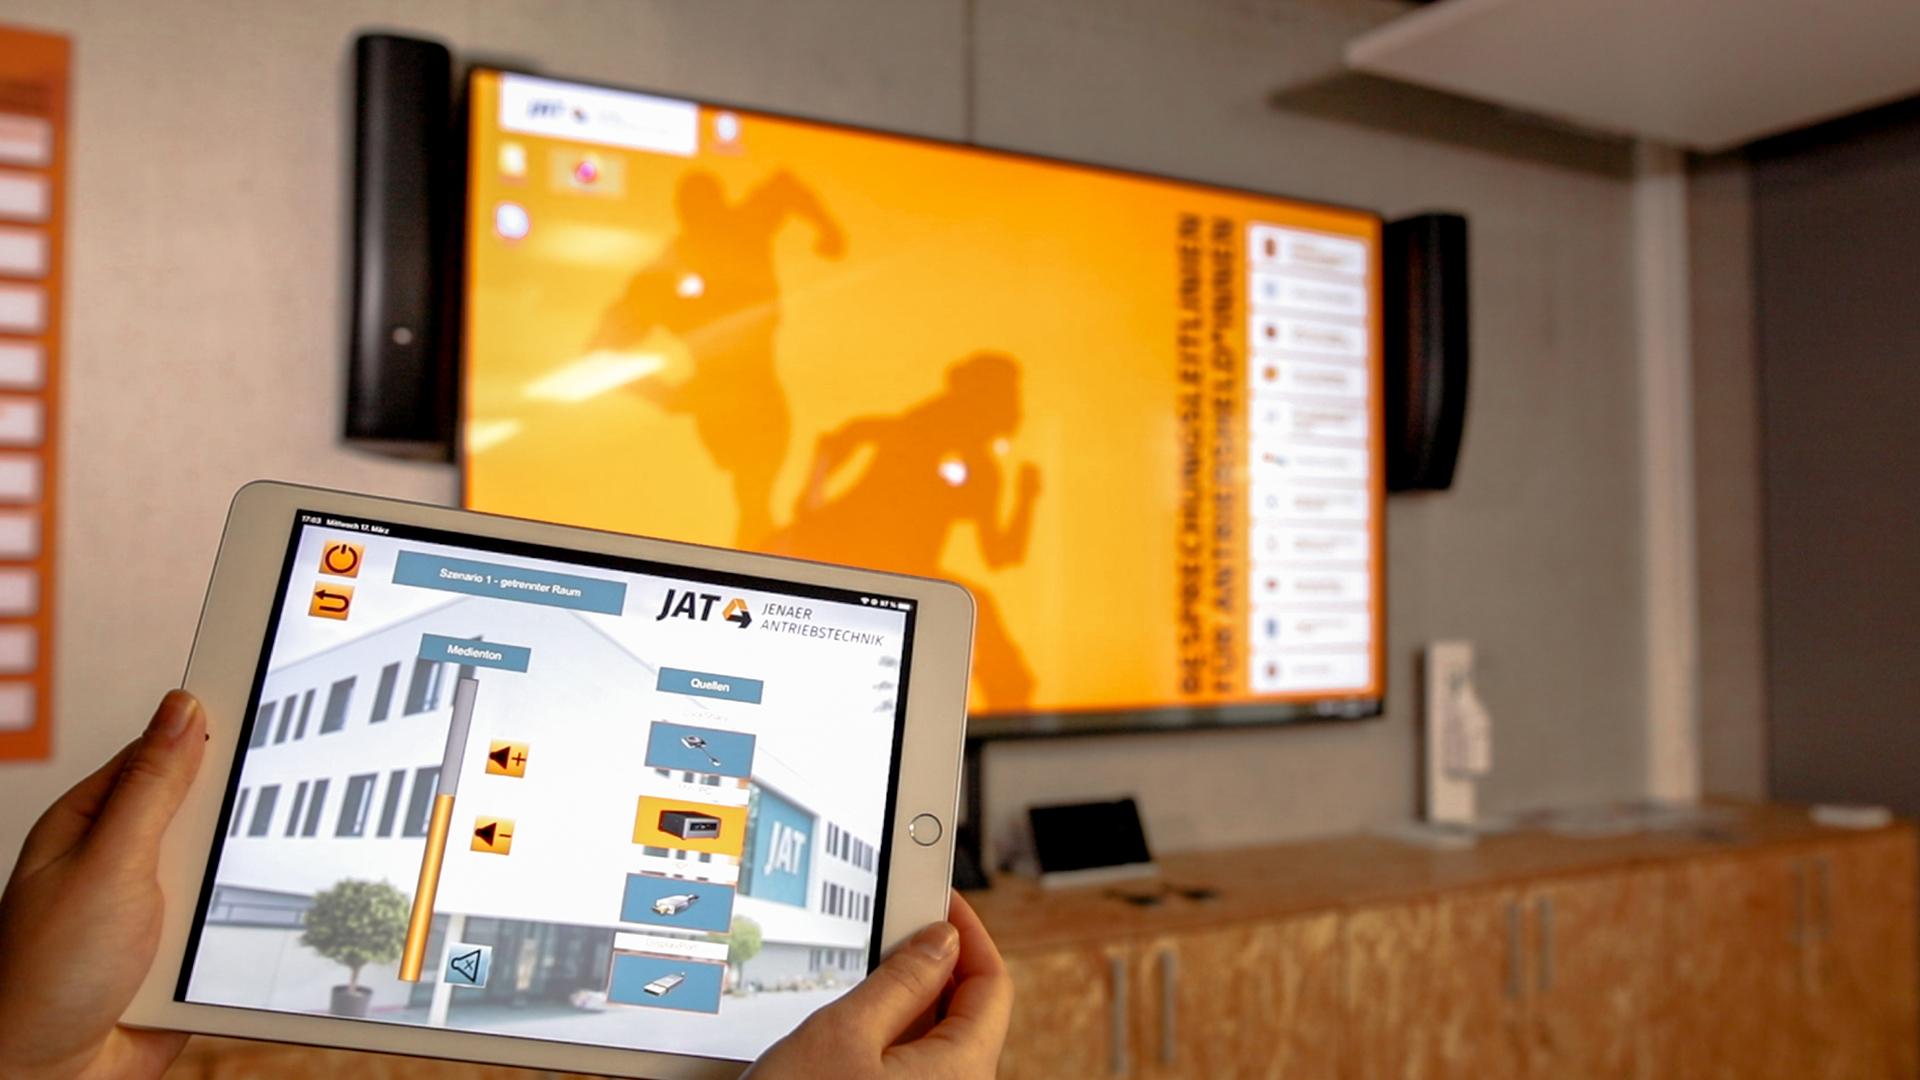 Touchpad iPad in JAT